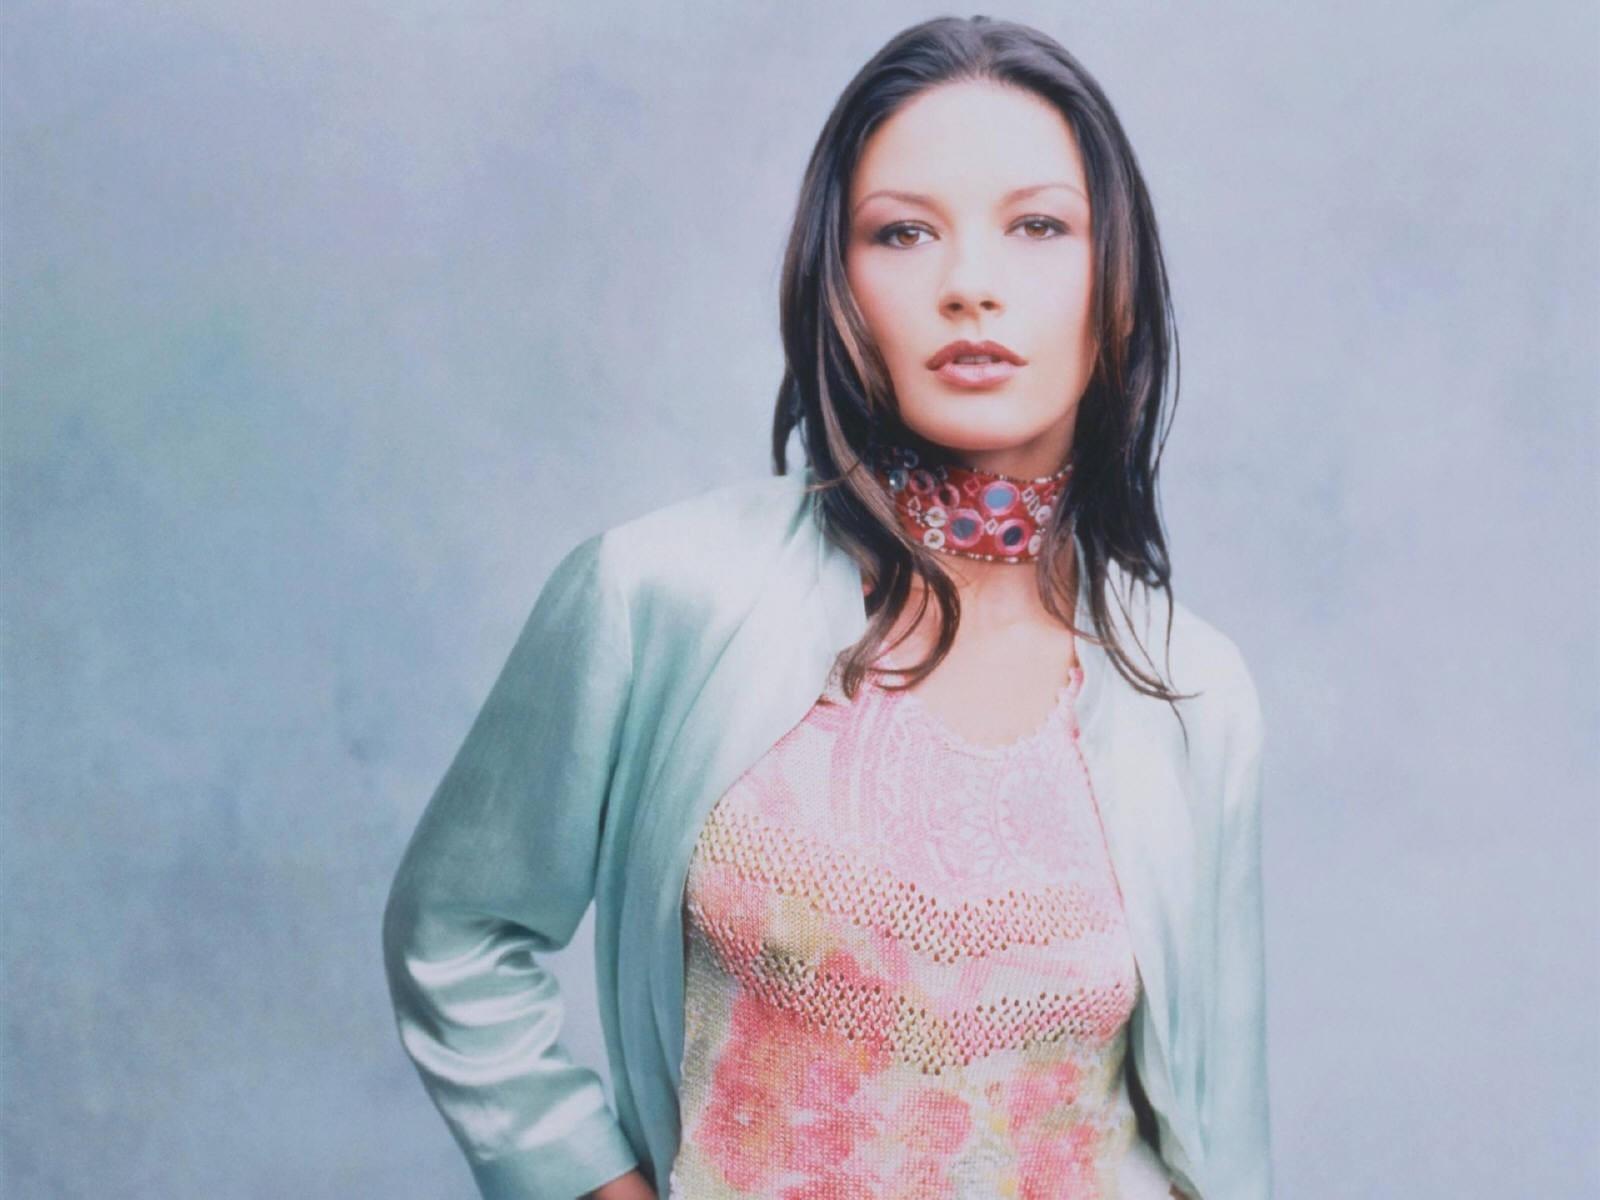 Wallpaper di Catherine Zeta-Jones 6